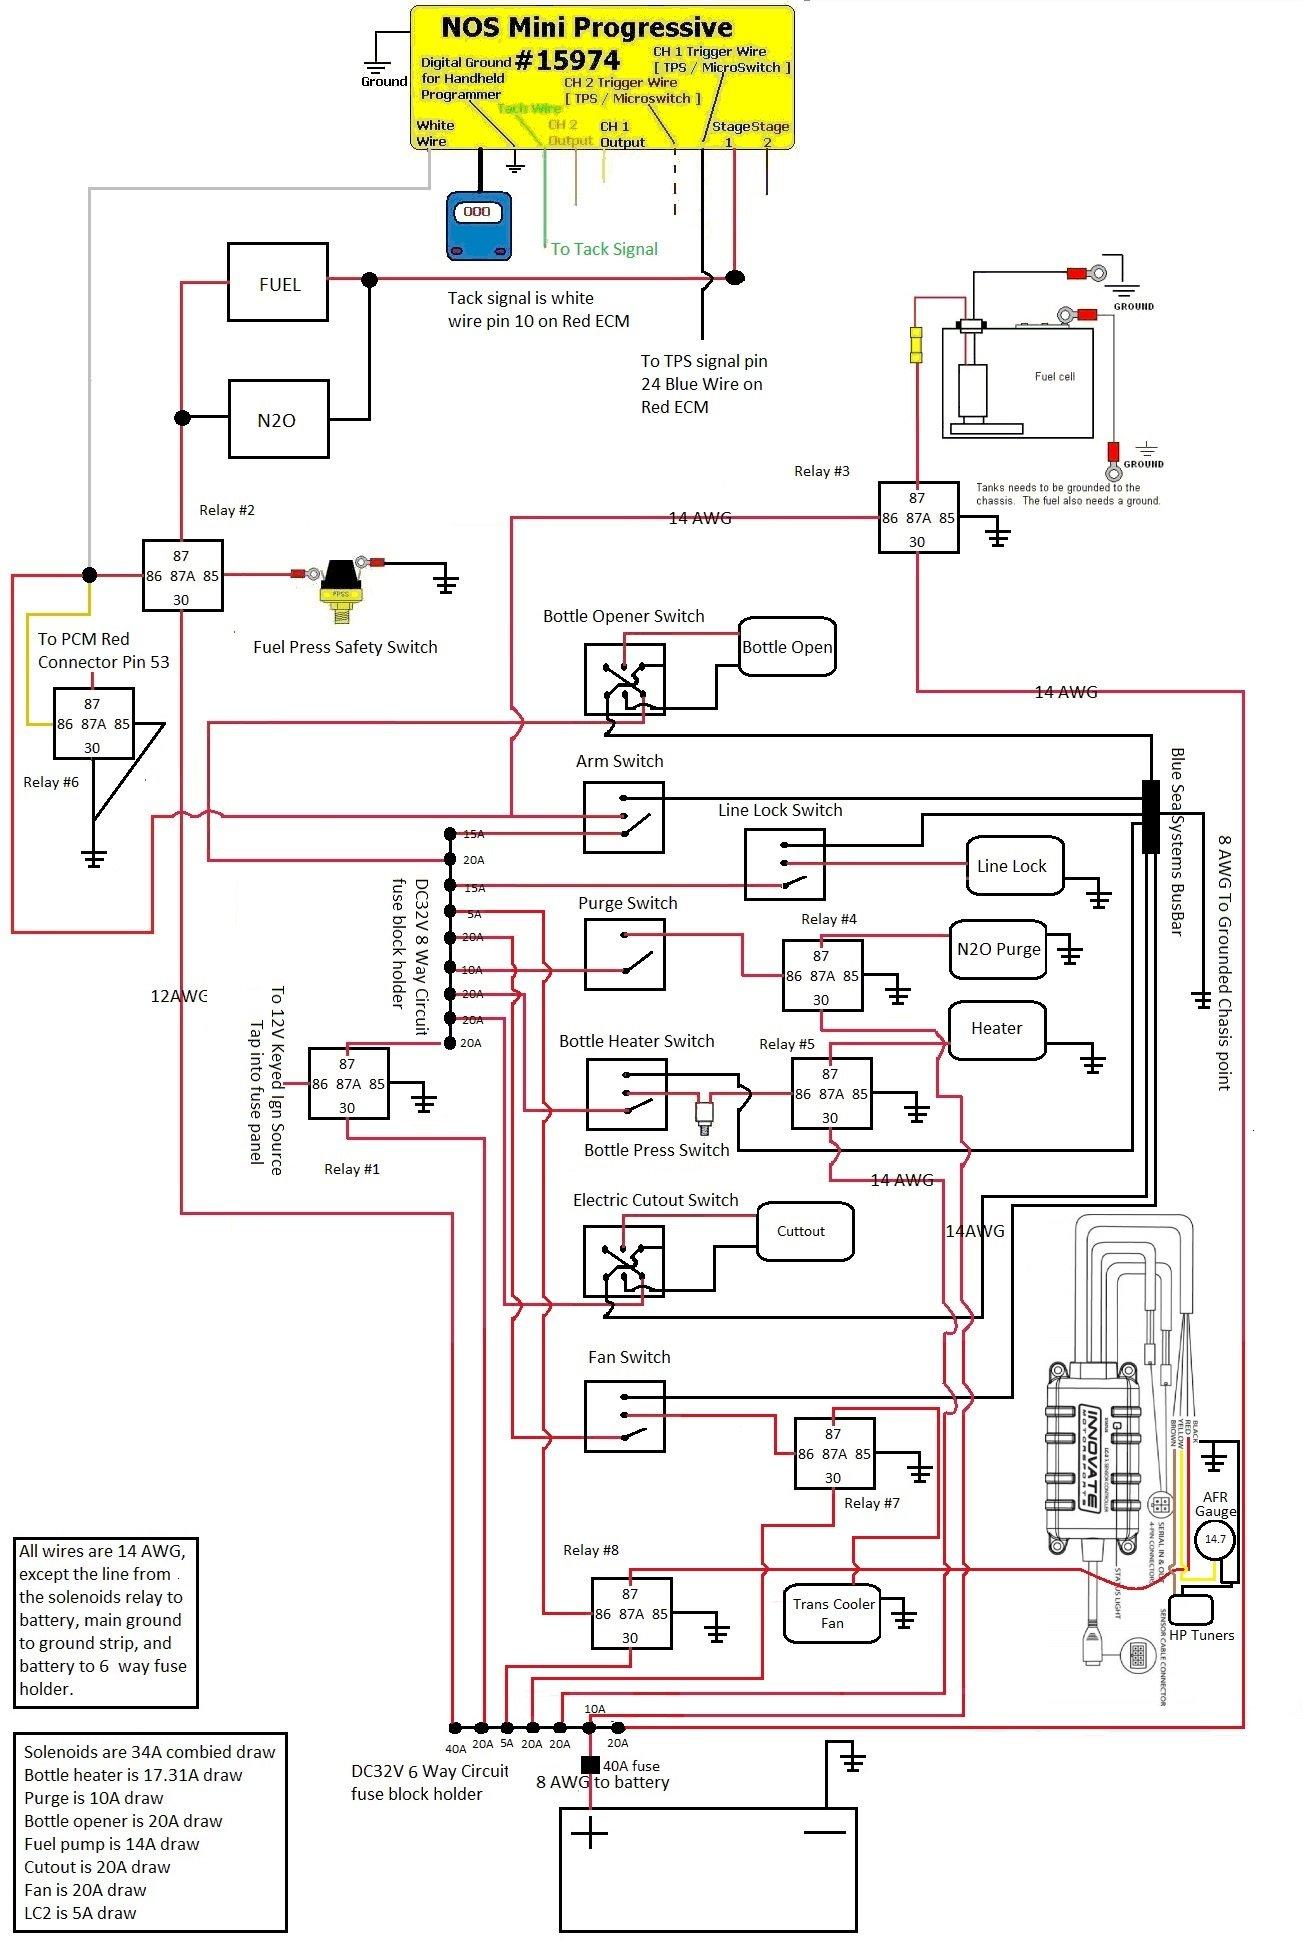 Progresser Nitrous Wiring Diagram For To 6 Volt Golf Cart Wiring Diagram For Wiring Diagram Schematics